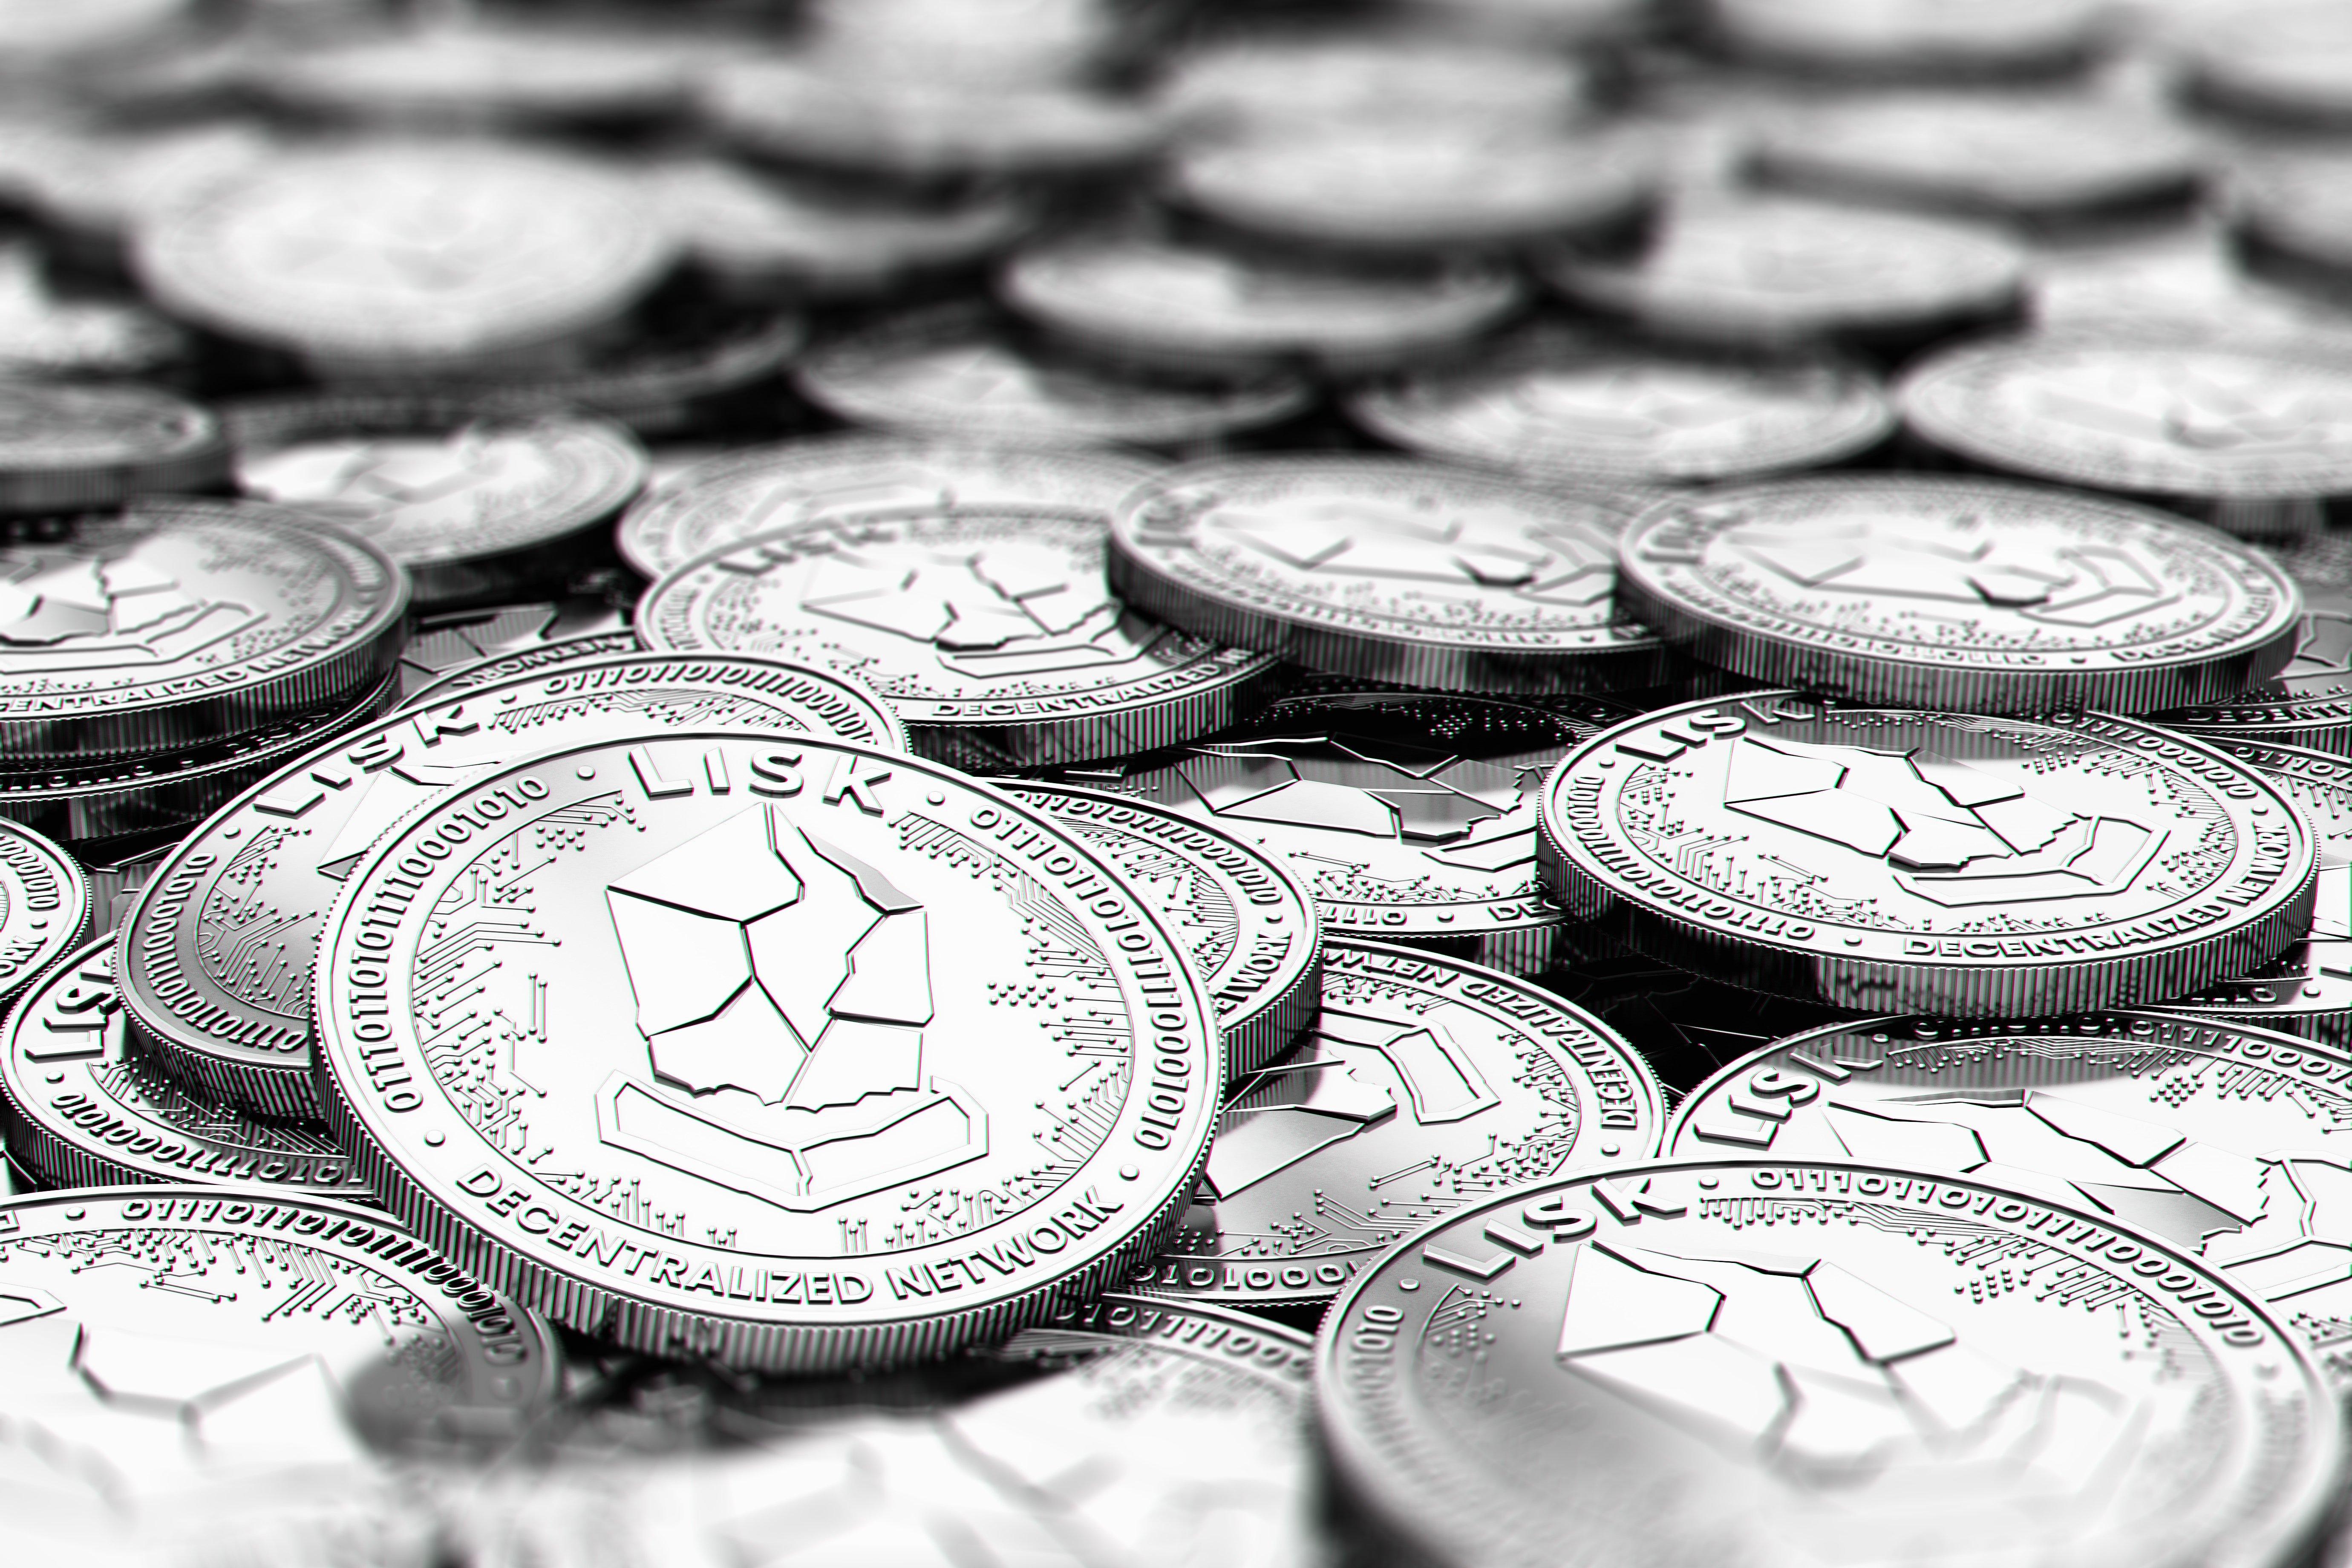 stack of silver lisk coins